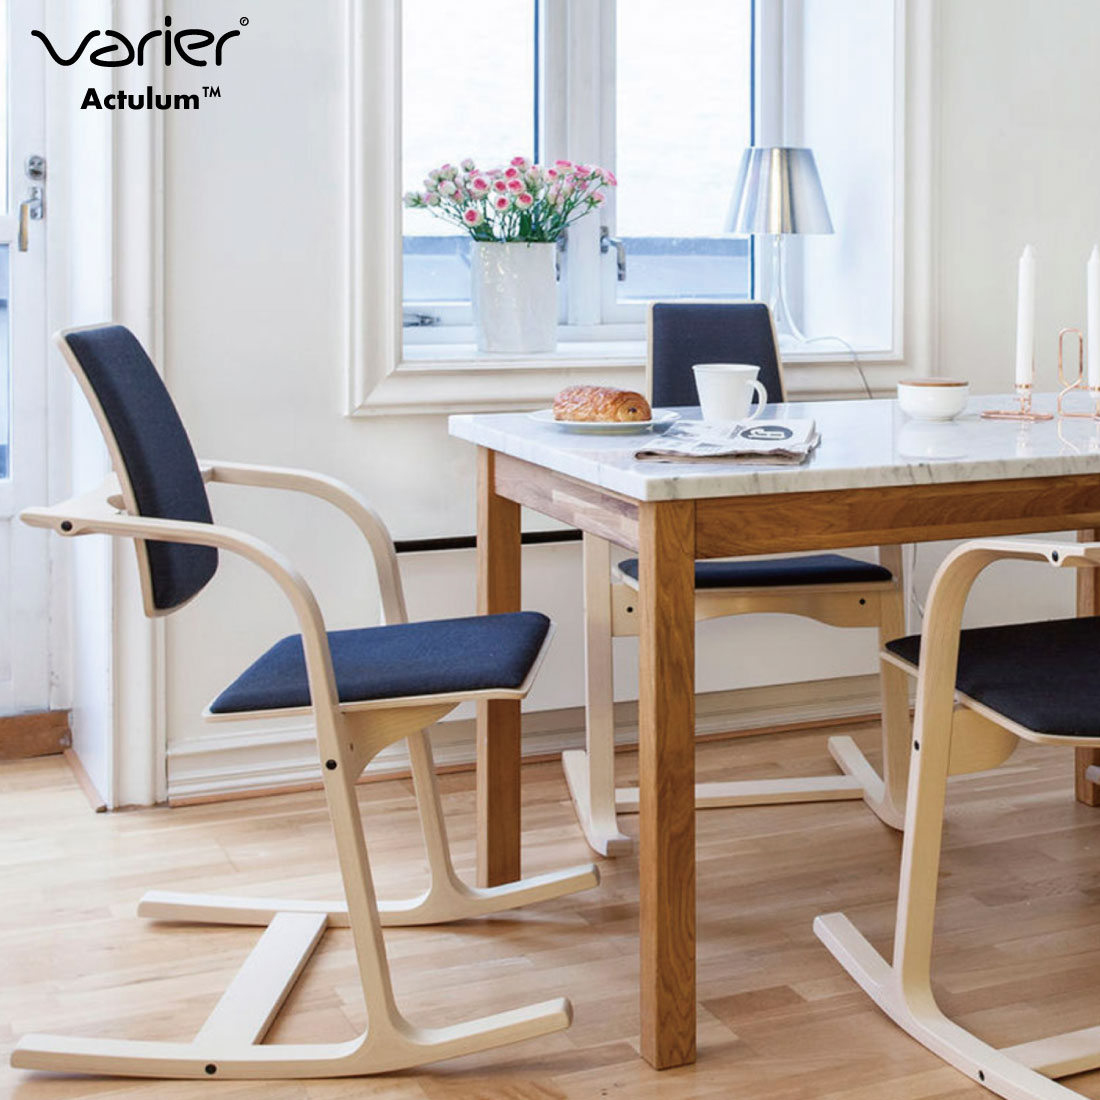 【Varier/ヴァリエール】Actulum アクチュラム/イス/椅子/chair//V03/